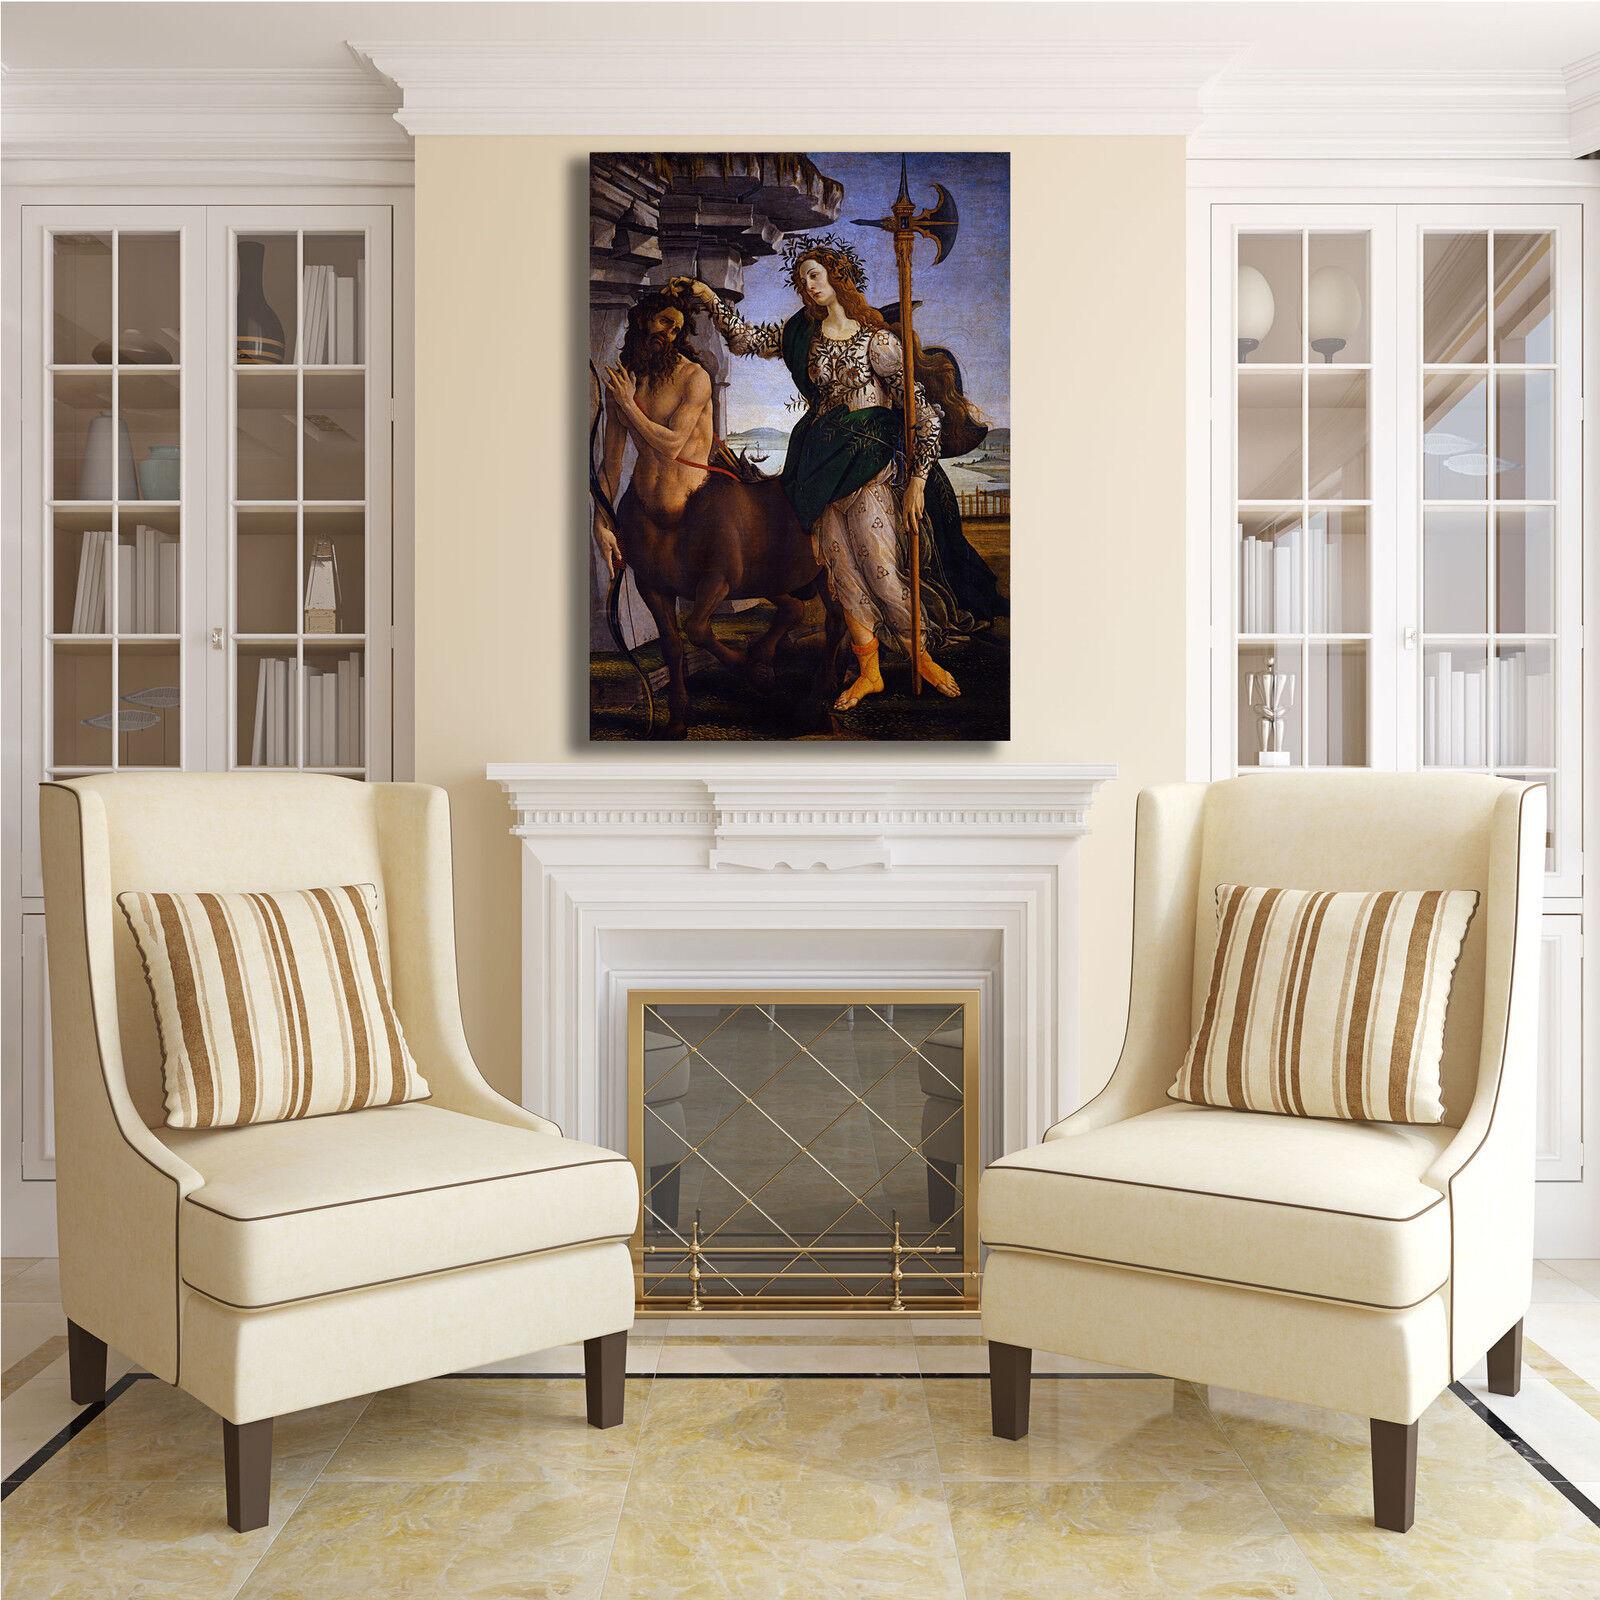 Botticelli Pallade e il centauro quadro stampa tela dipinto telaio telaio telaio arrossoo casa 153b70